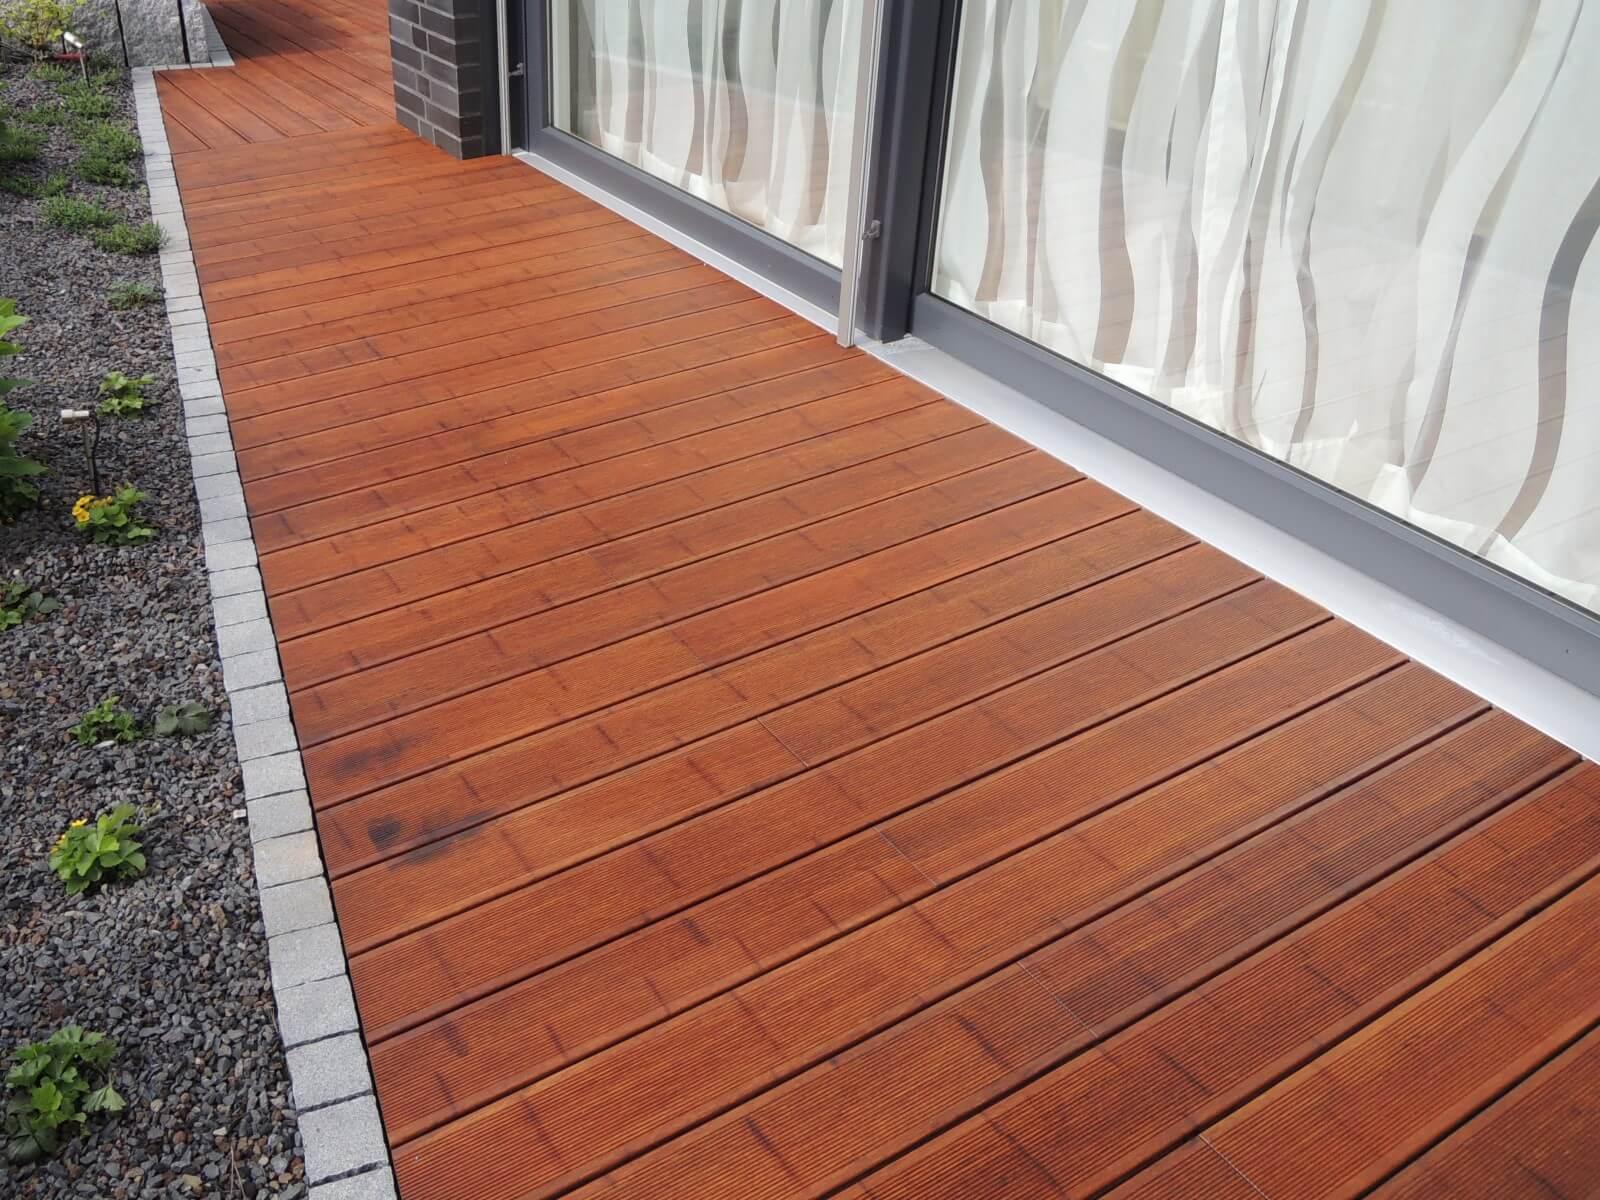 bambus dielen terrasse bd99 hitoiro. Black Bedroom Furniture Sets. Home Design Ideas